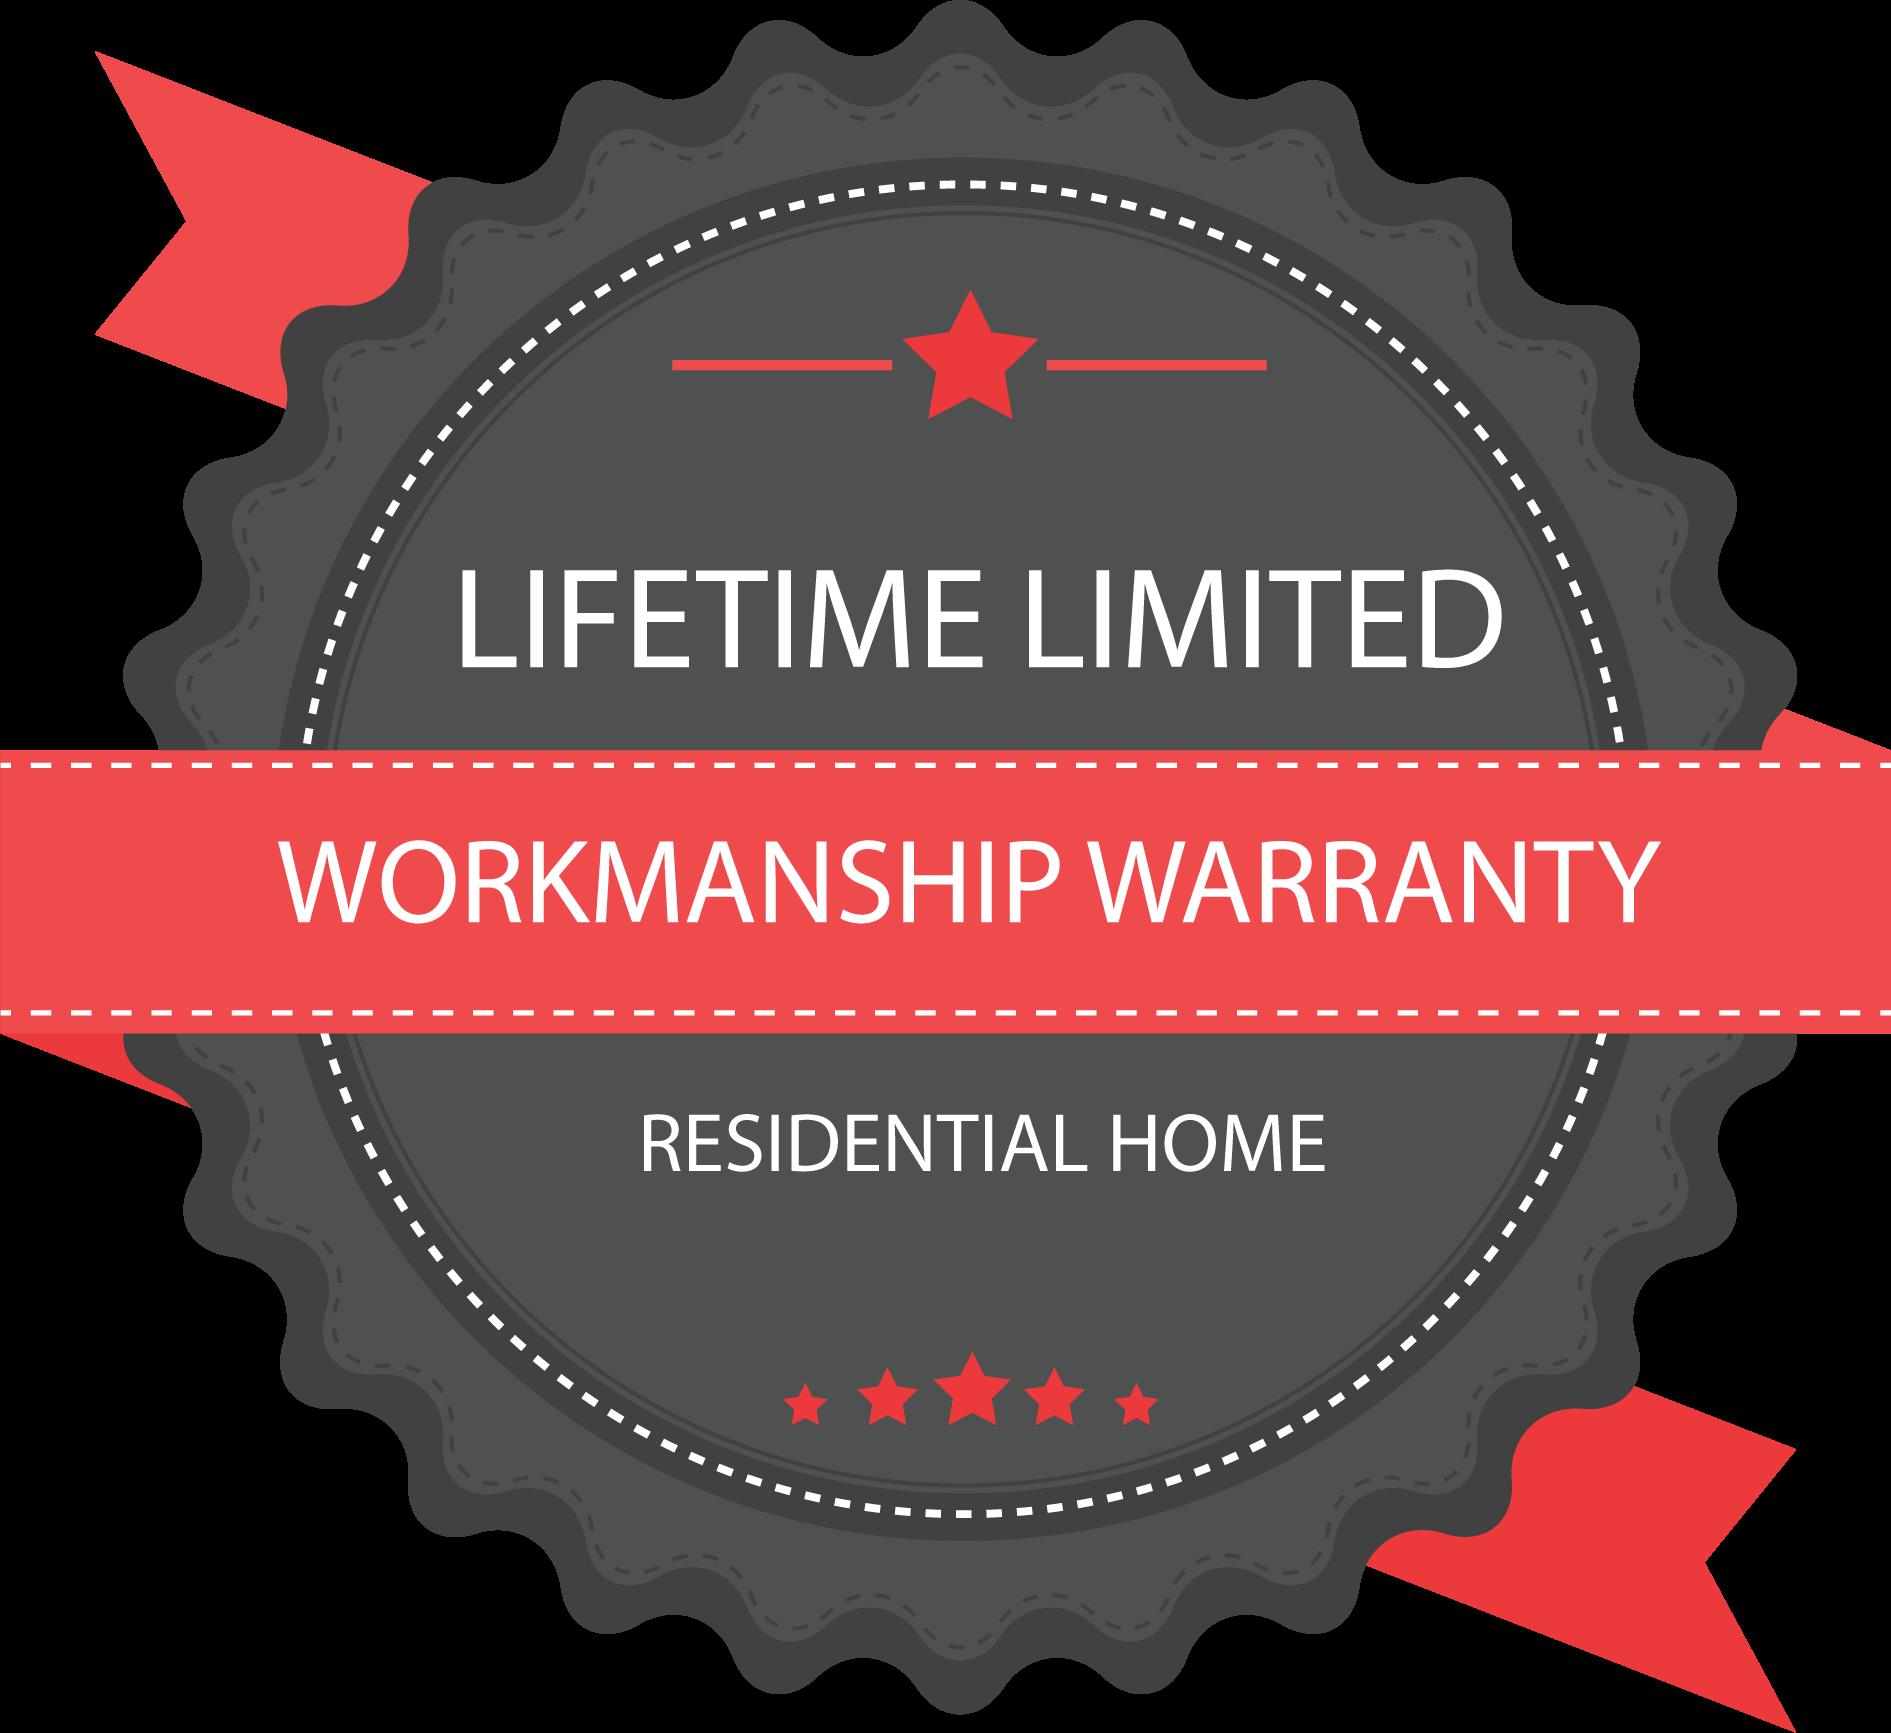 1st Choice Home Solution's Limited Lifetime Warranty Workmanship Badge